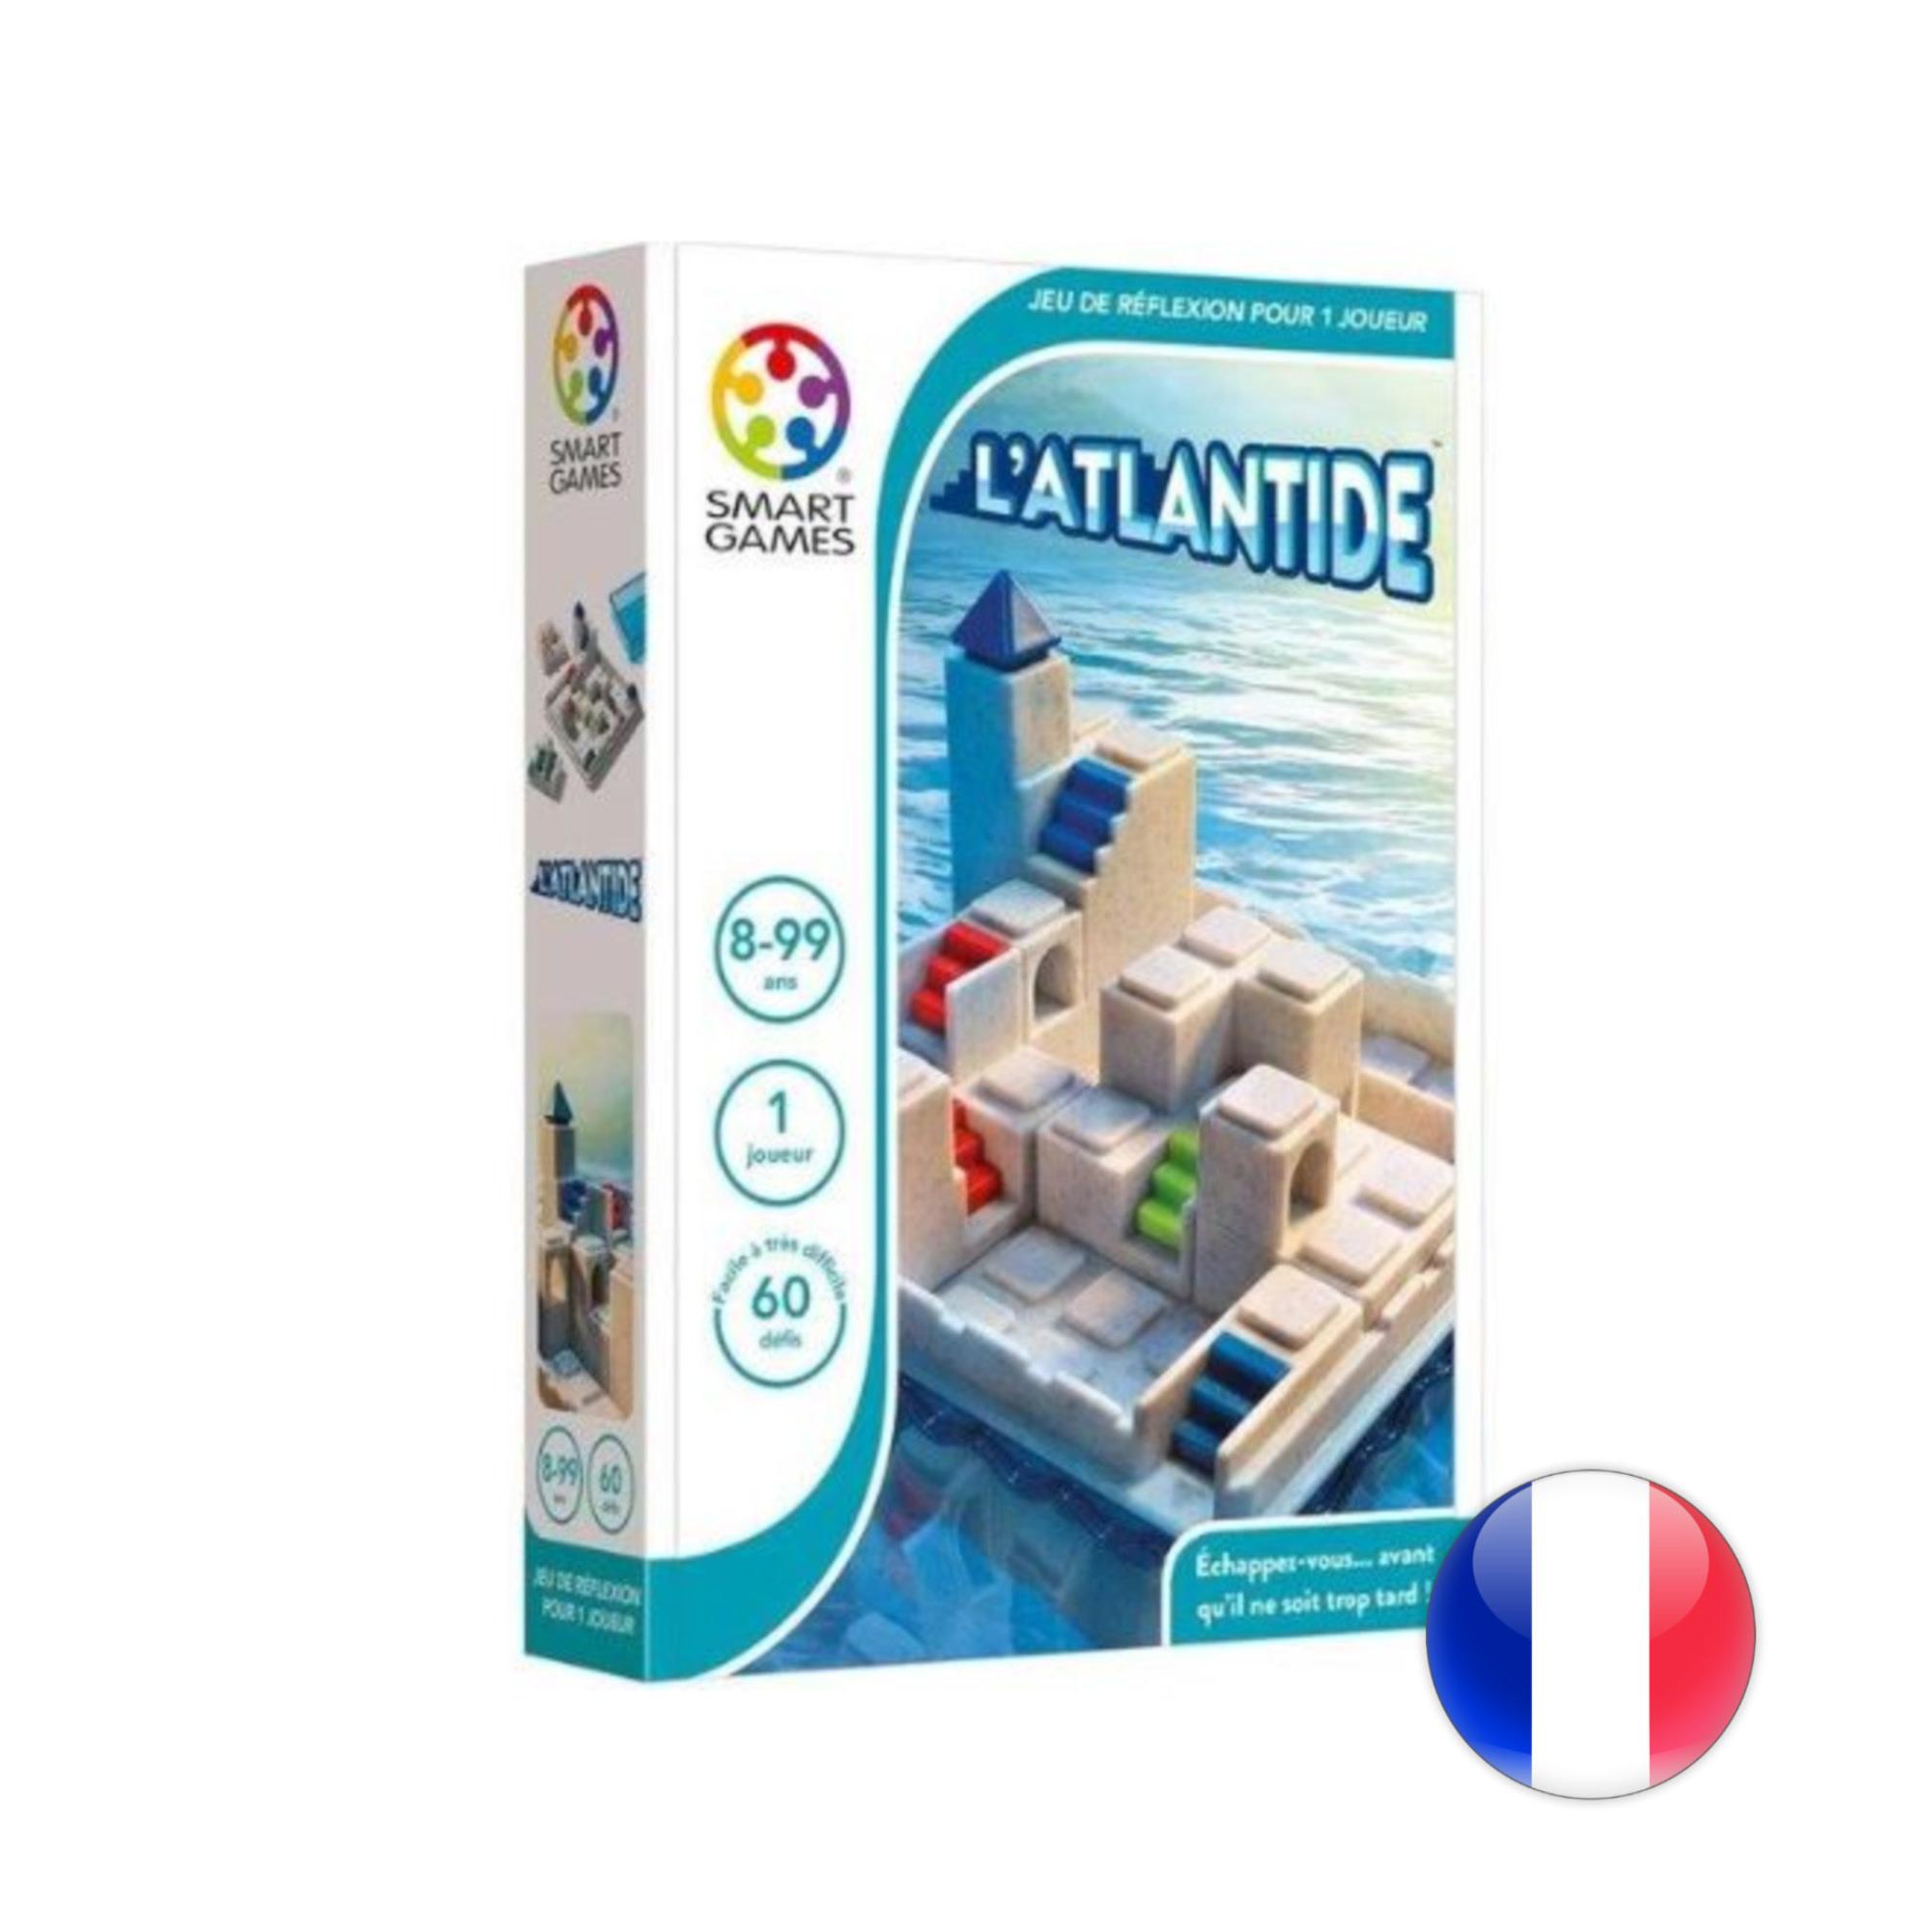 Smart Games L'Alantide